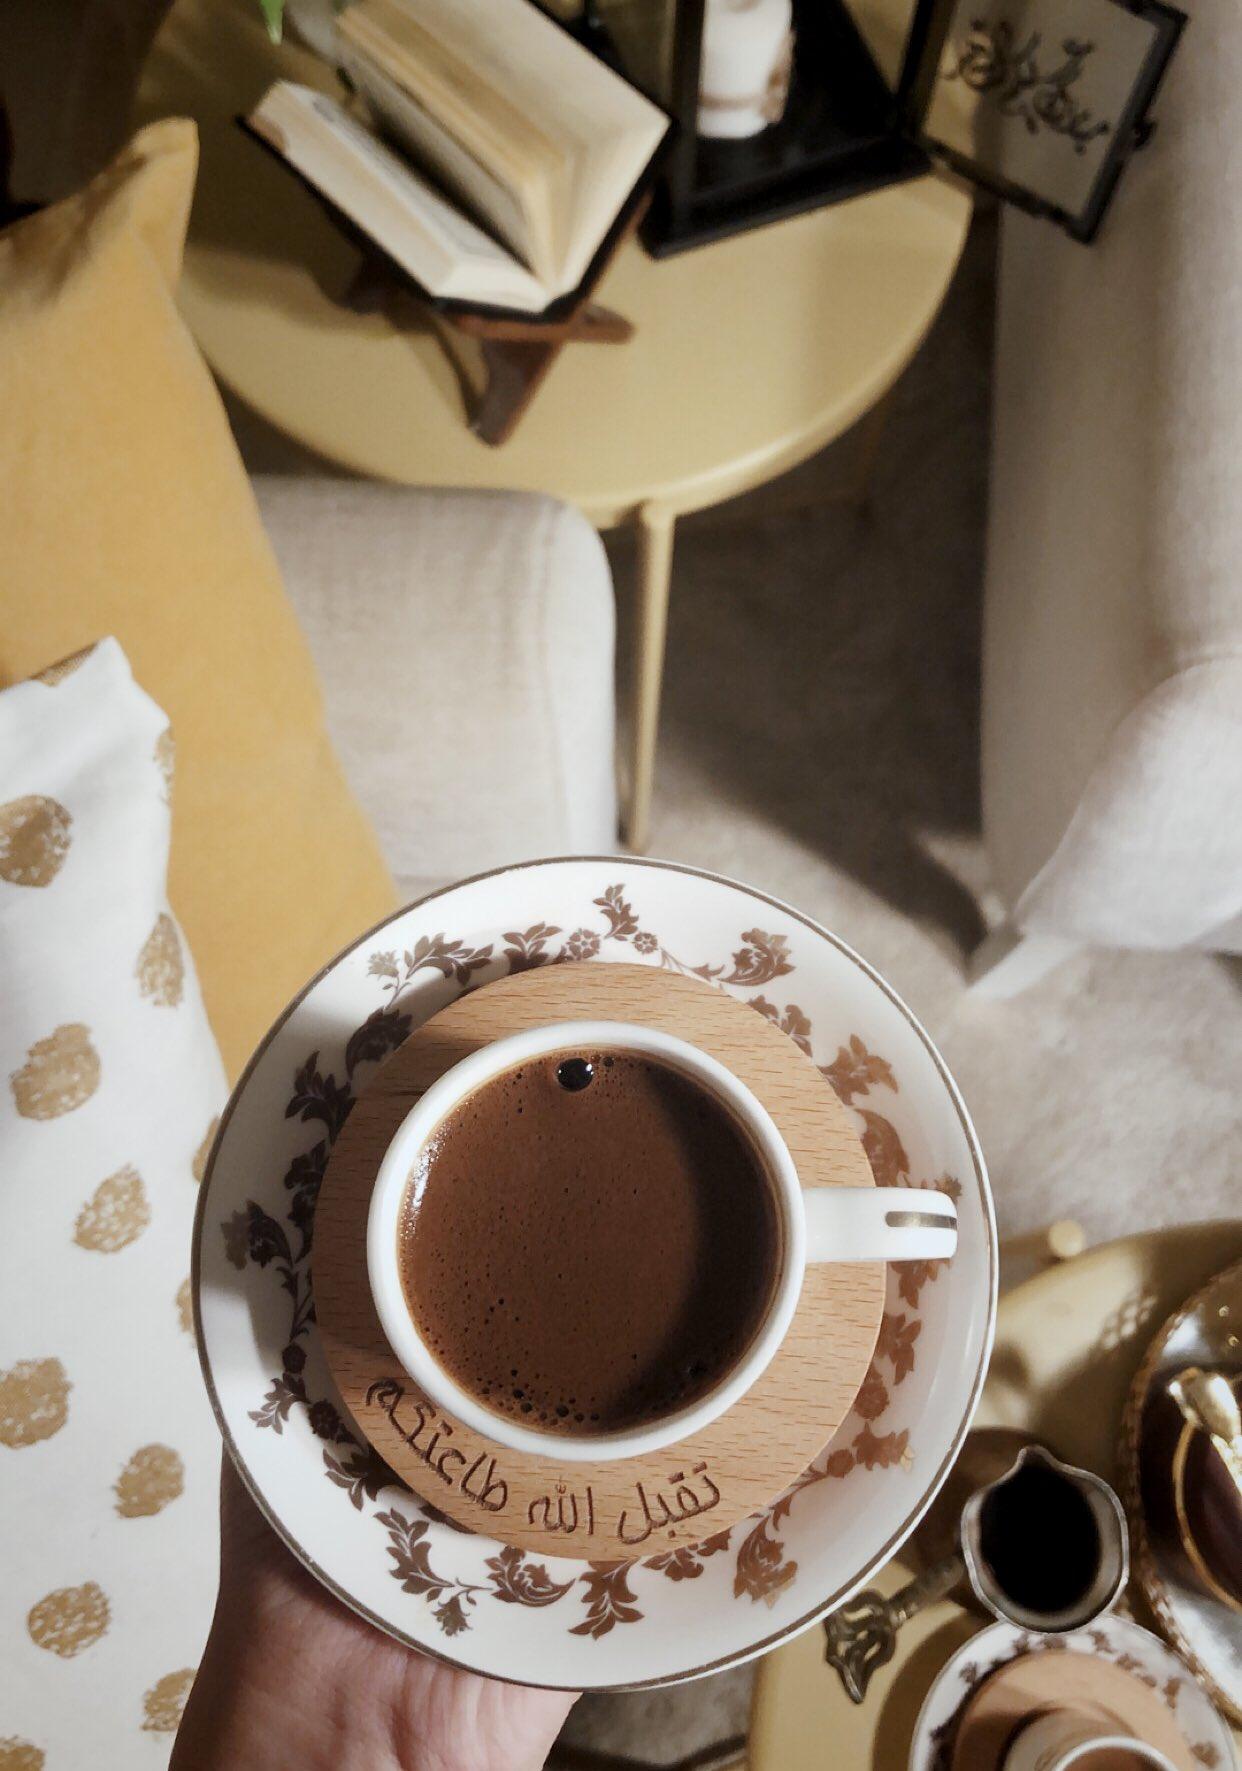 𝐀𝐌𝐀𝐋 On Twitter م ن م سك نات المزاج بعد الفطور ريحة القهوة والبخور